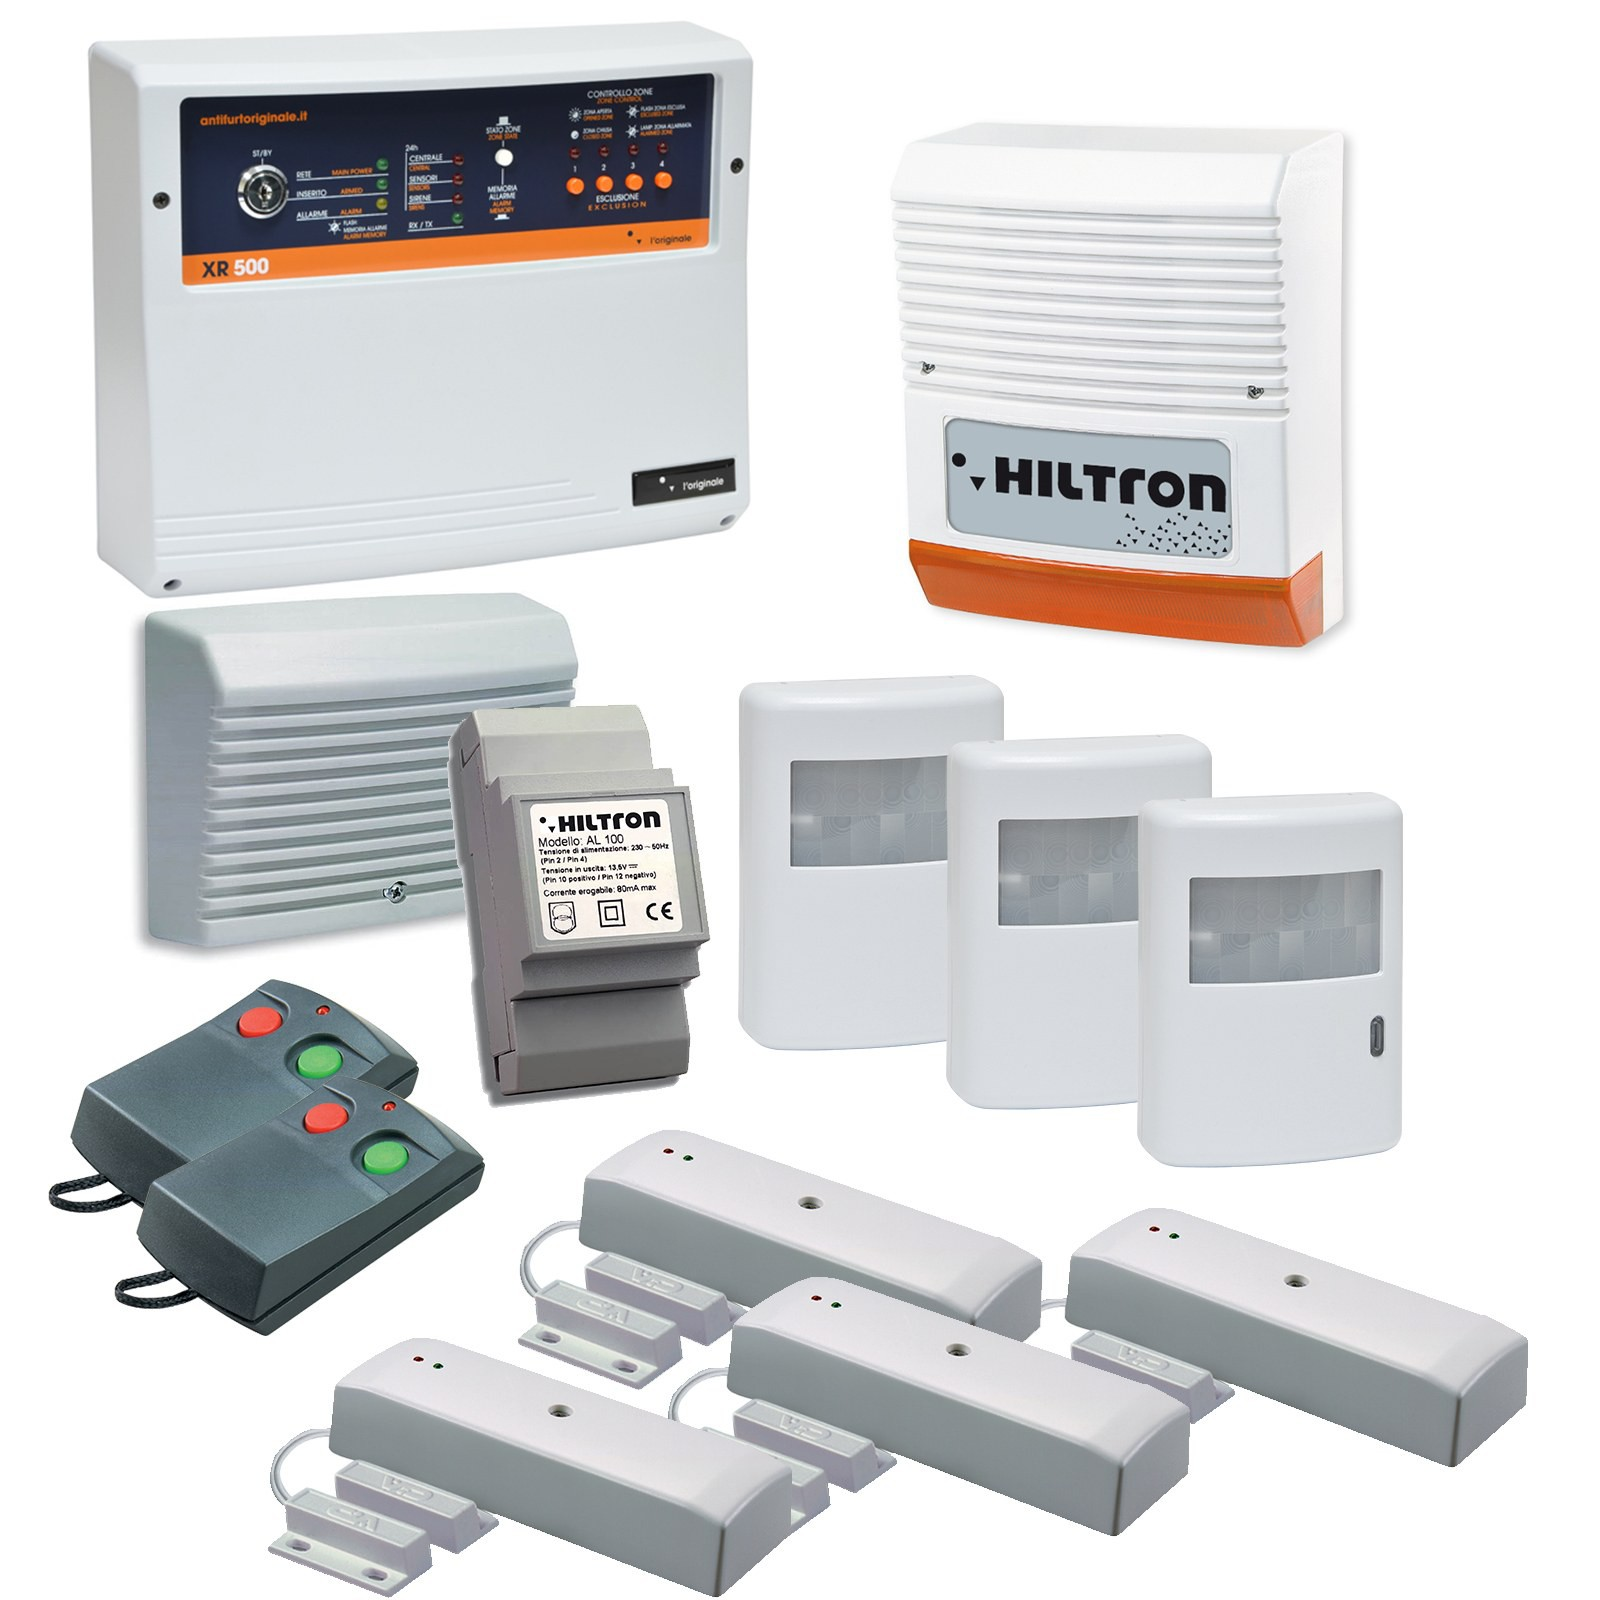 Antifurto allarme casa kit wireless senza fili hiltron kd5007 sirena sensori pir area illumina - Allarme per casa senza fili ...